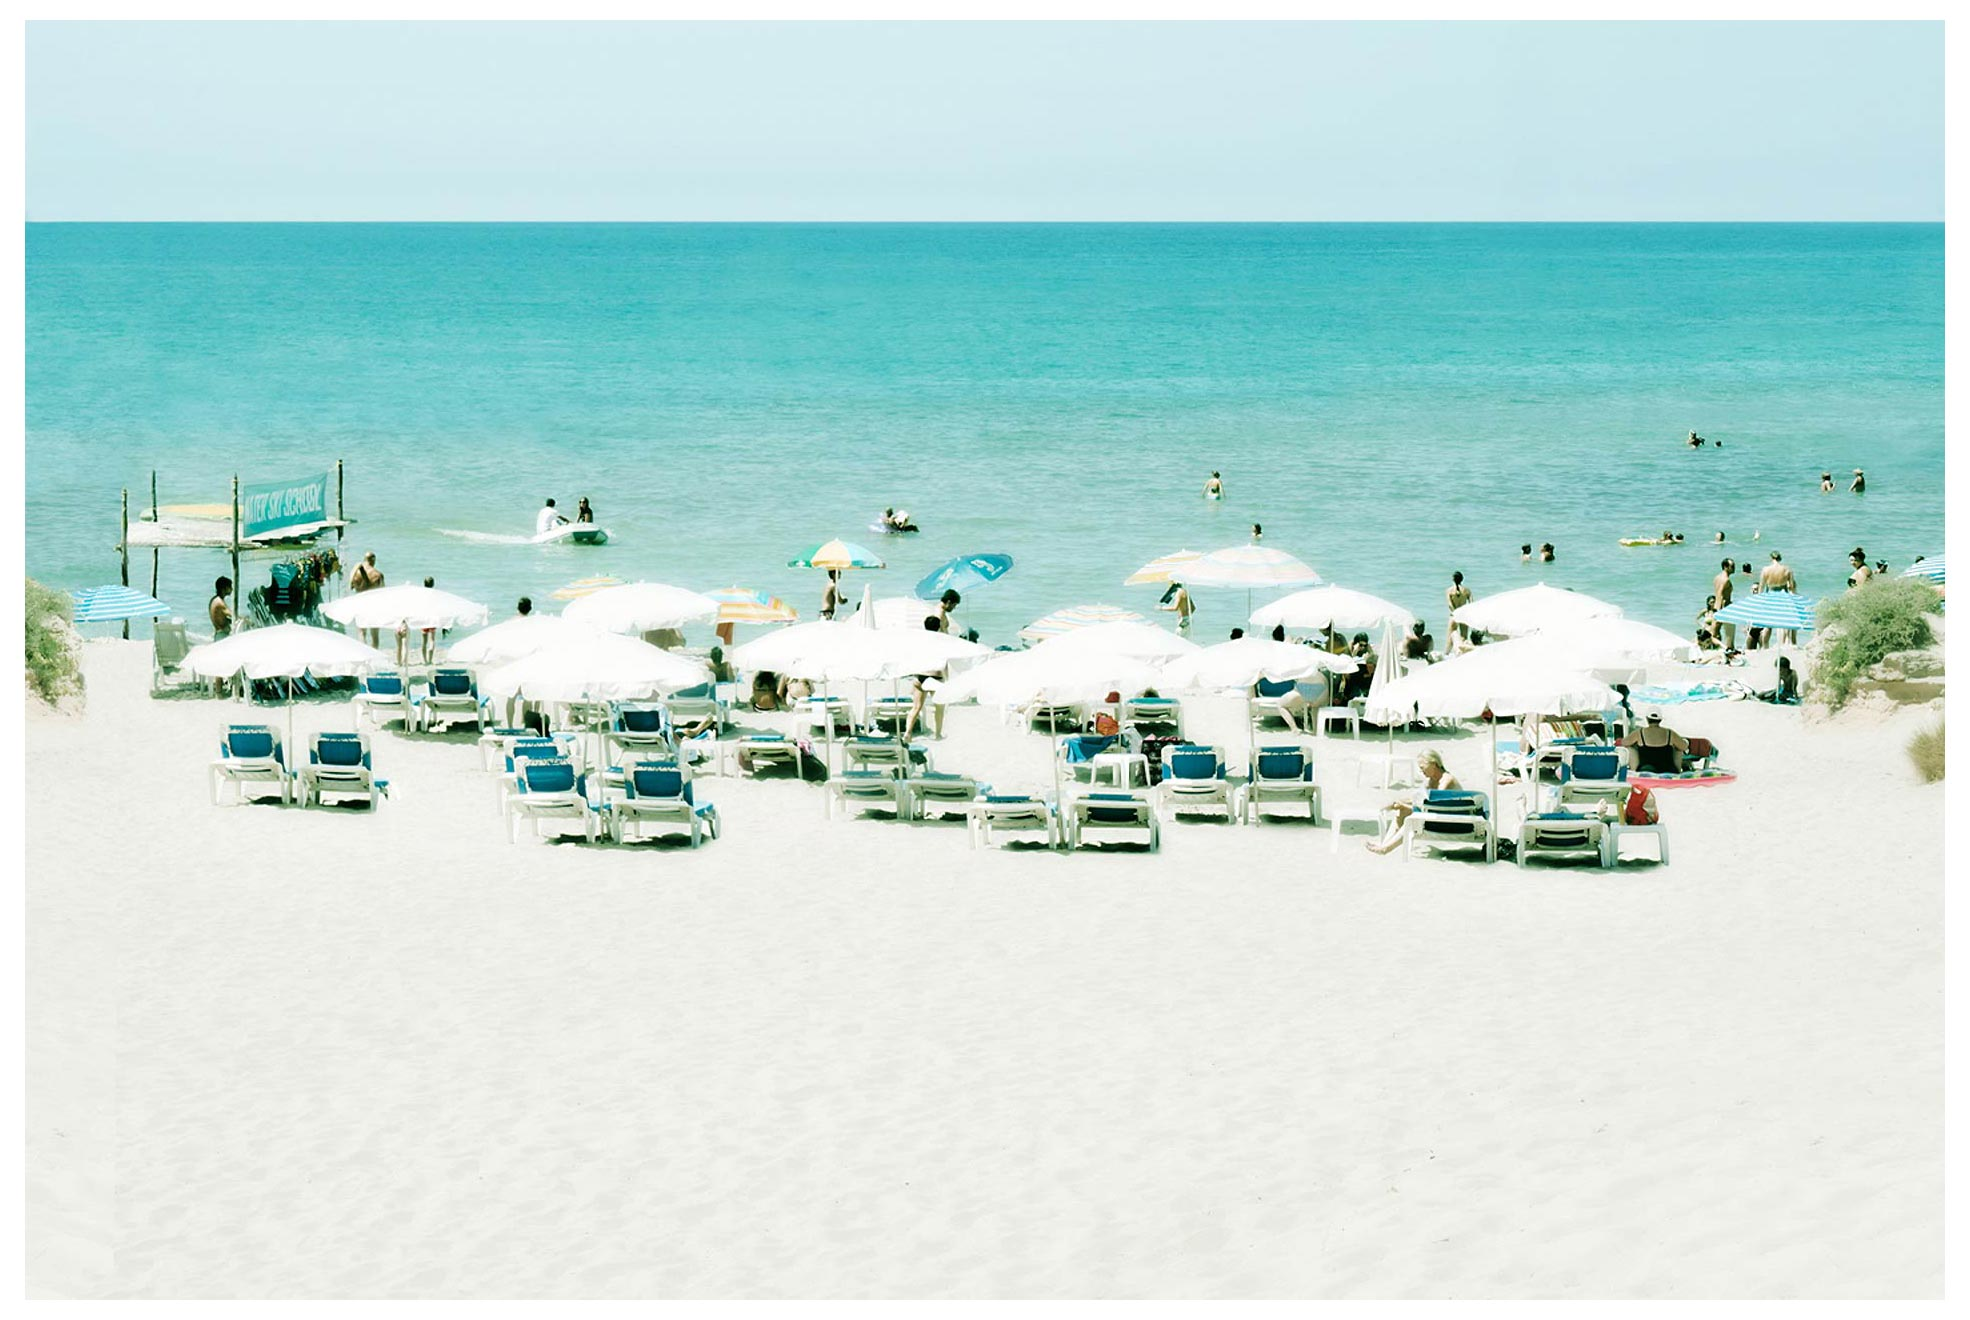 Ibiza photography by Stephane Dessaint #1